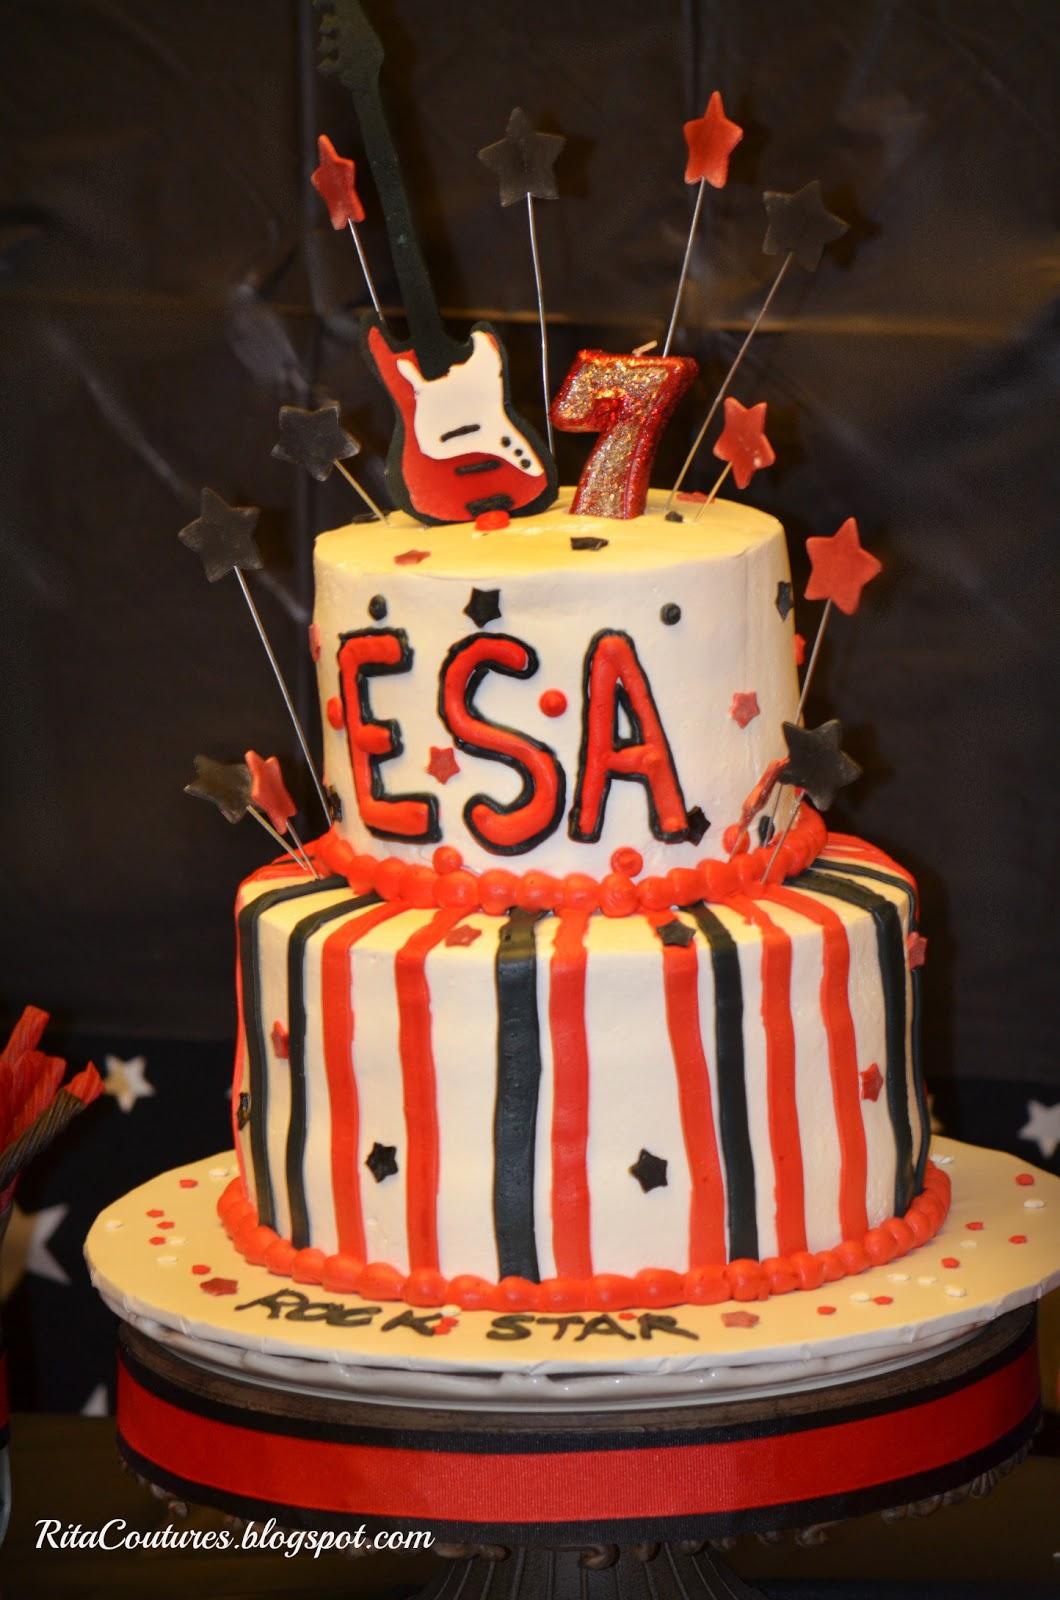 Rita Couture Happy Birthday Rock Star Esa